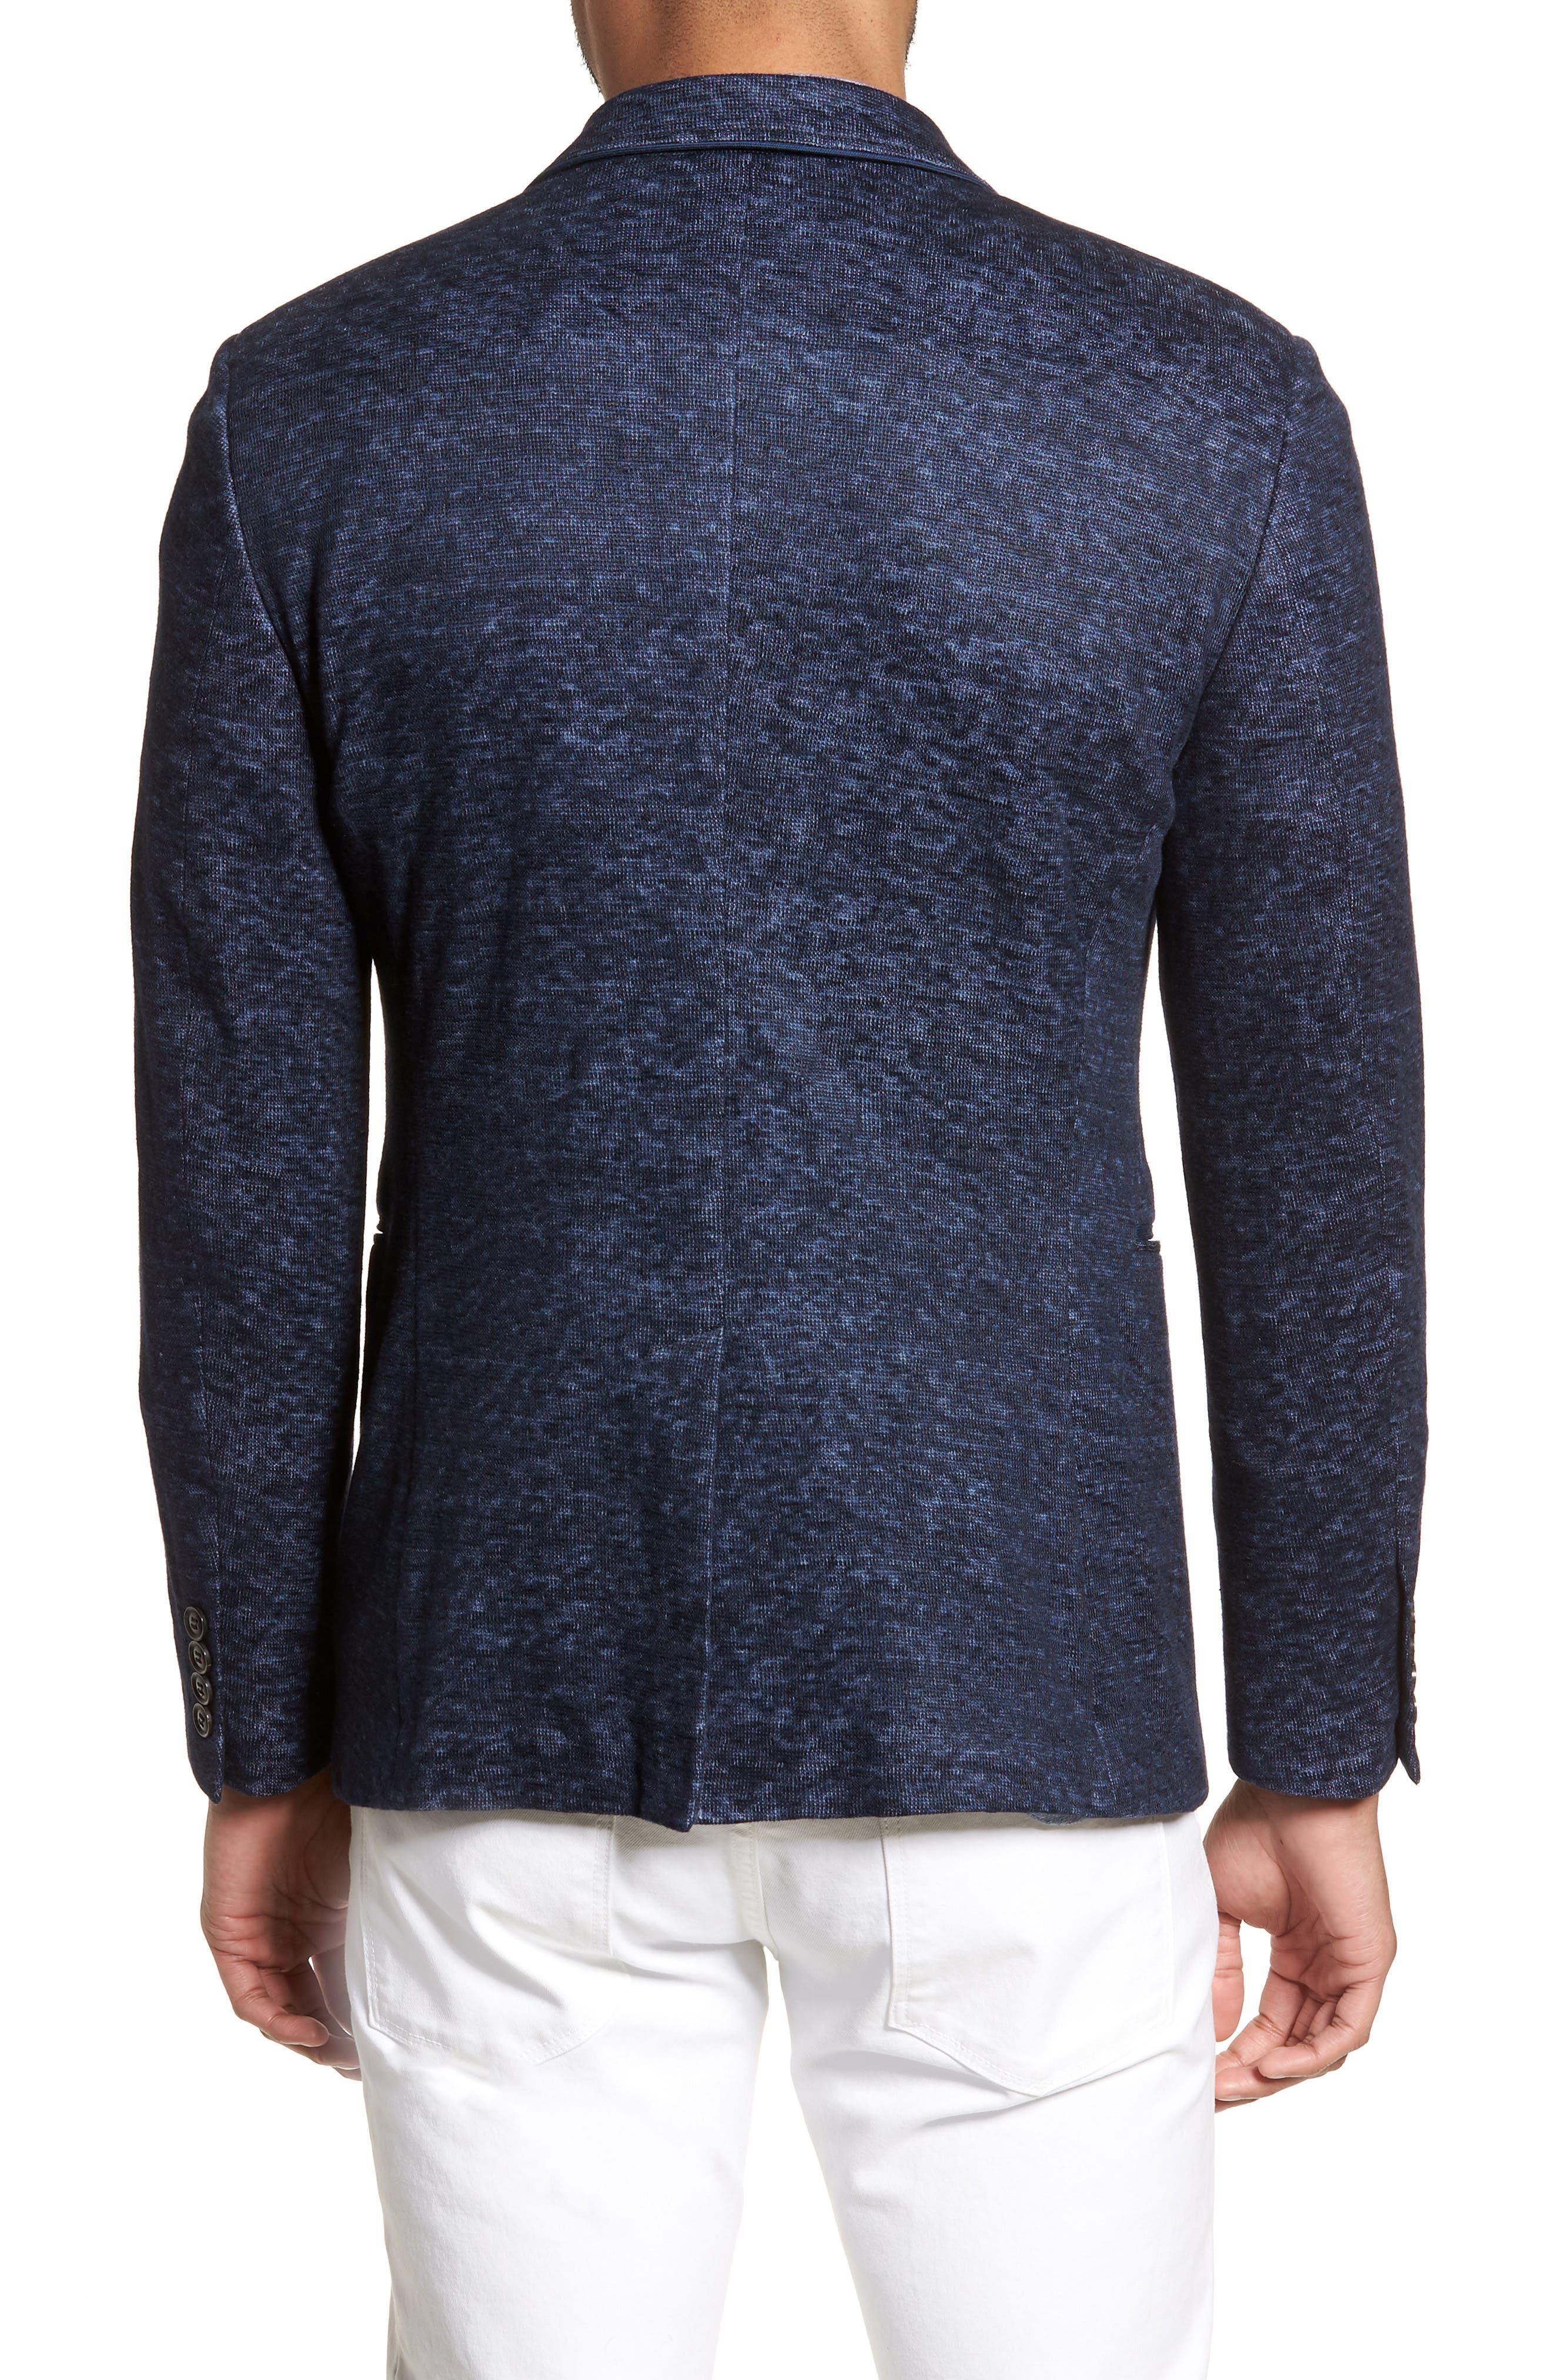 Regular Fit Cotton & Linen Blazer,                             Alternate thumbnail 2, color,                             Officer Blue